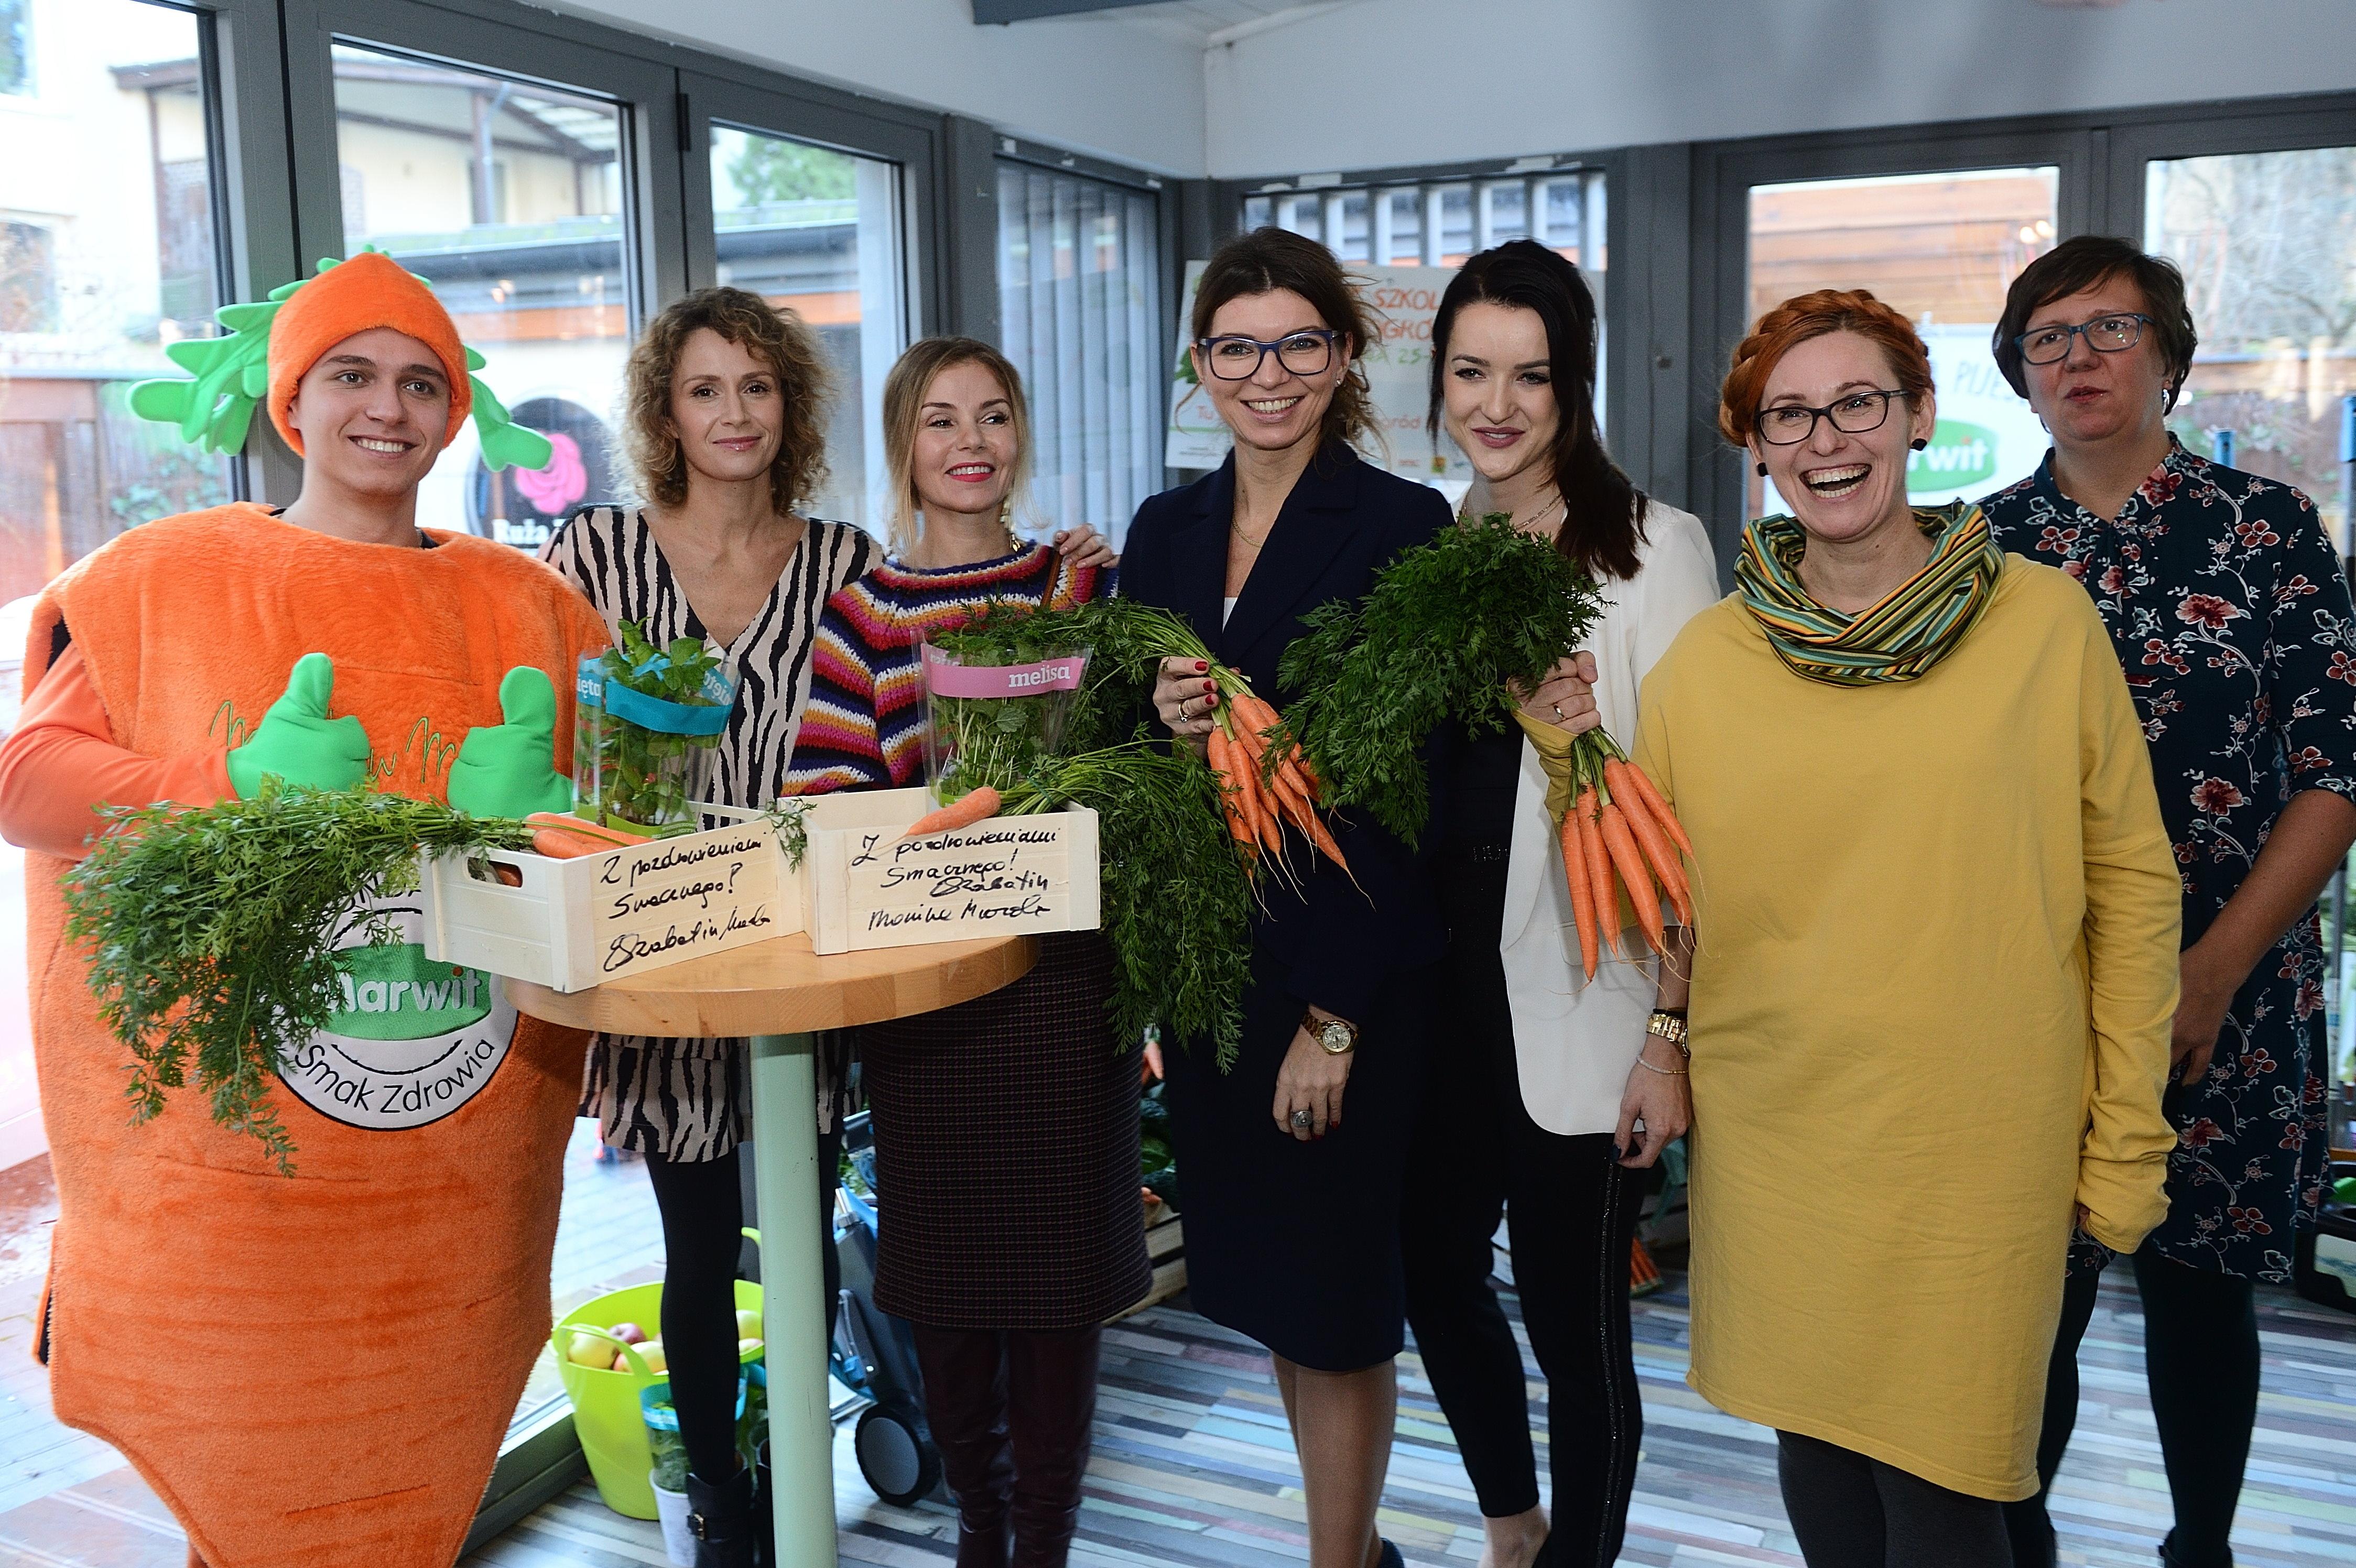 Monika Mrozowska, Ewa Szabatin, Anna Kruzińska- Pawłowska, Magdalena Foeller, Katarzyna Gubała, Krystyna Matelska- Tokarz